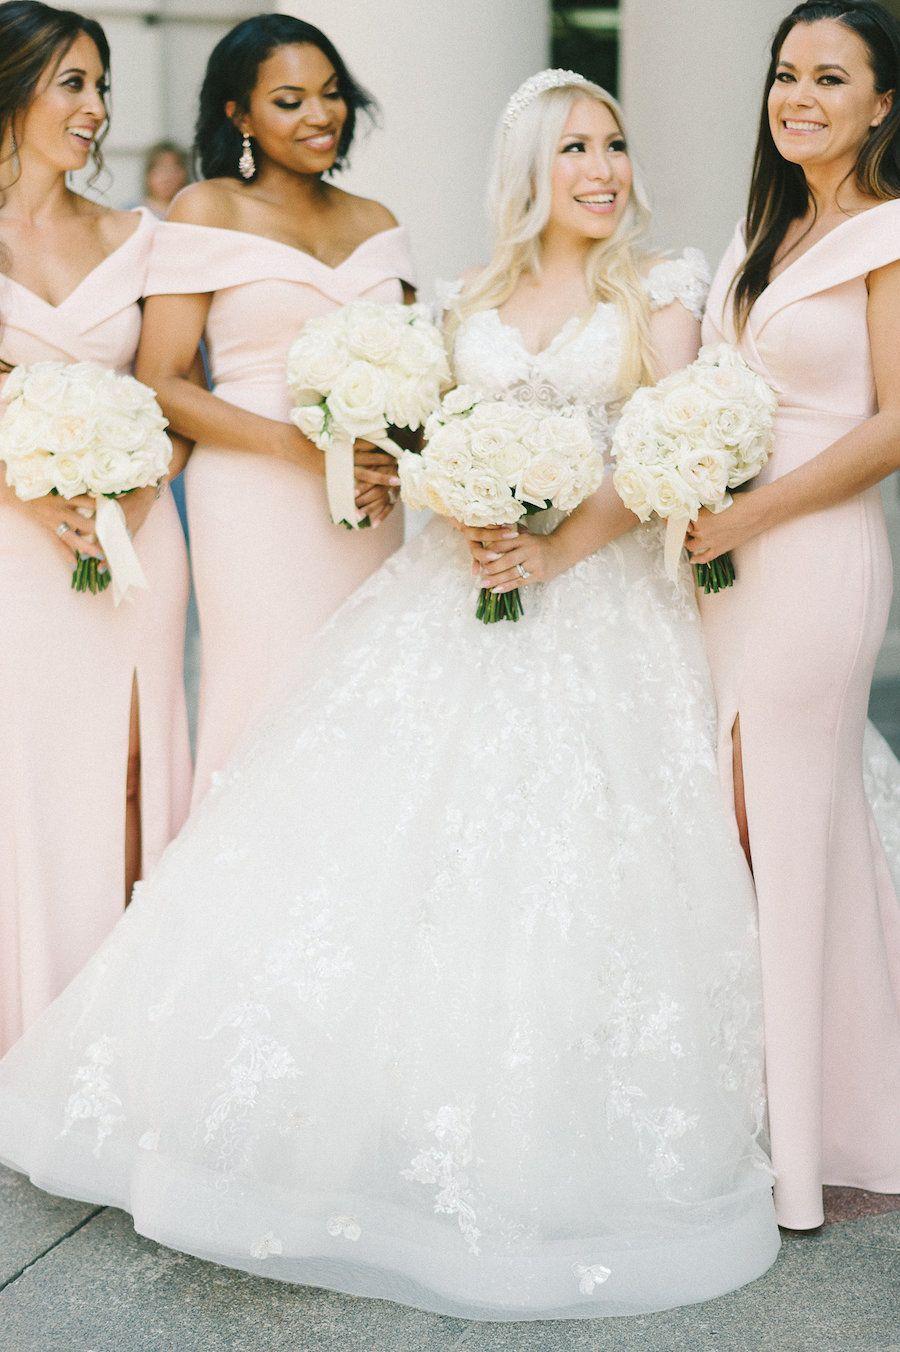 Glamorous Black And Gold Washington Dc Wedding At The Willard Modwedding Bridesmaid Dresses Cheap Bridesmaid Dresses Bridesmaid Attire [ 1352 x 900 Pixel ]